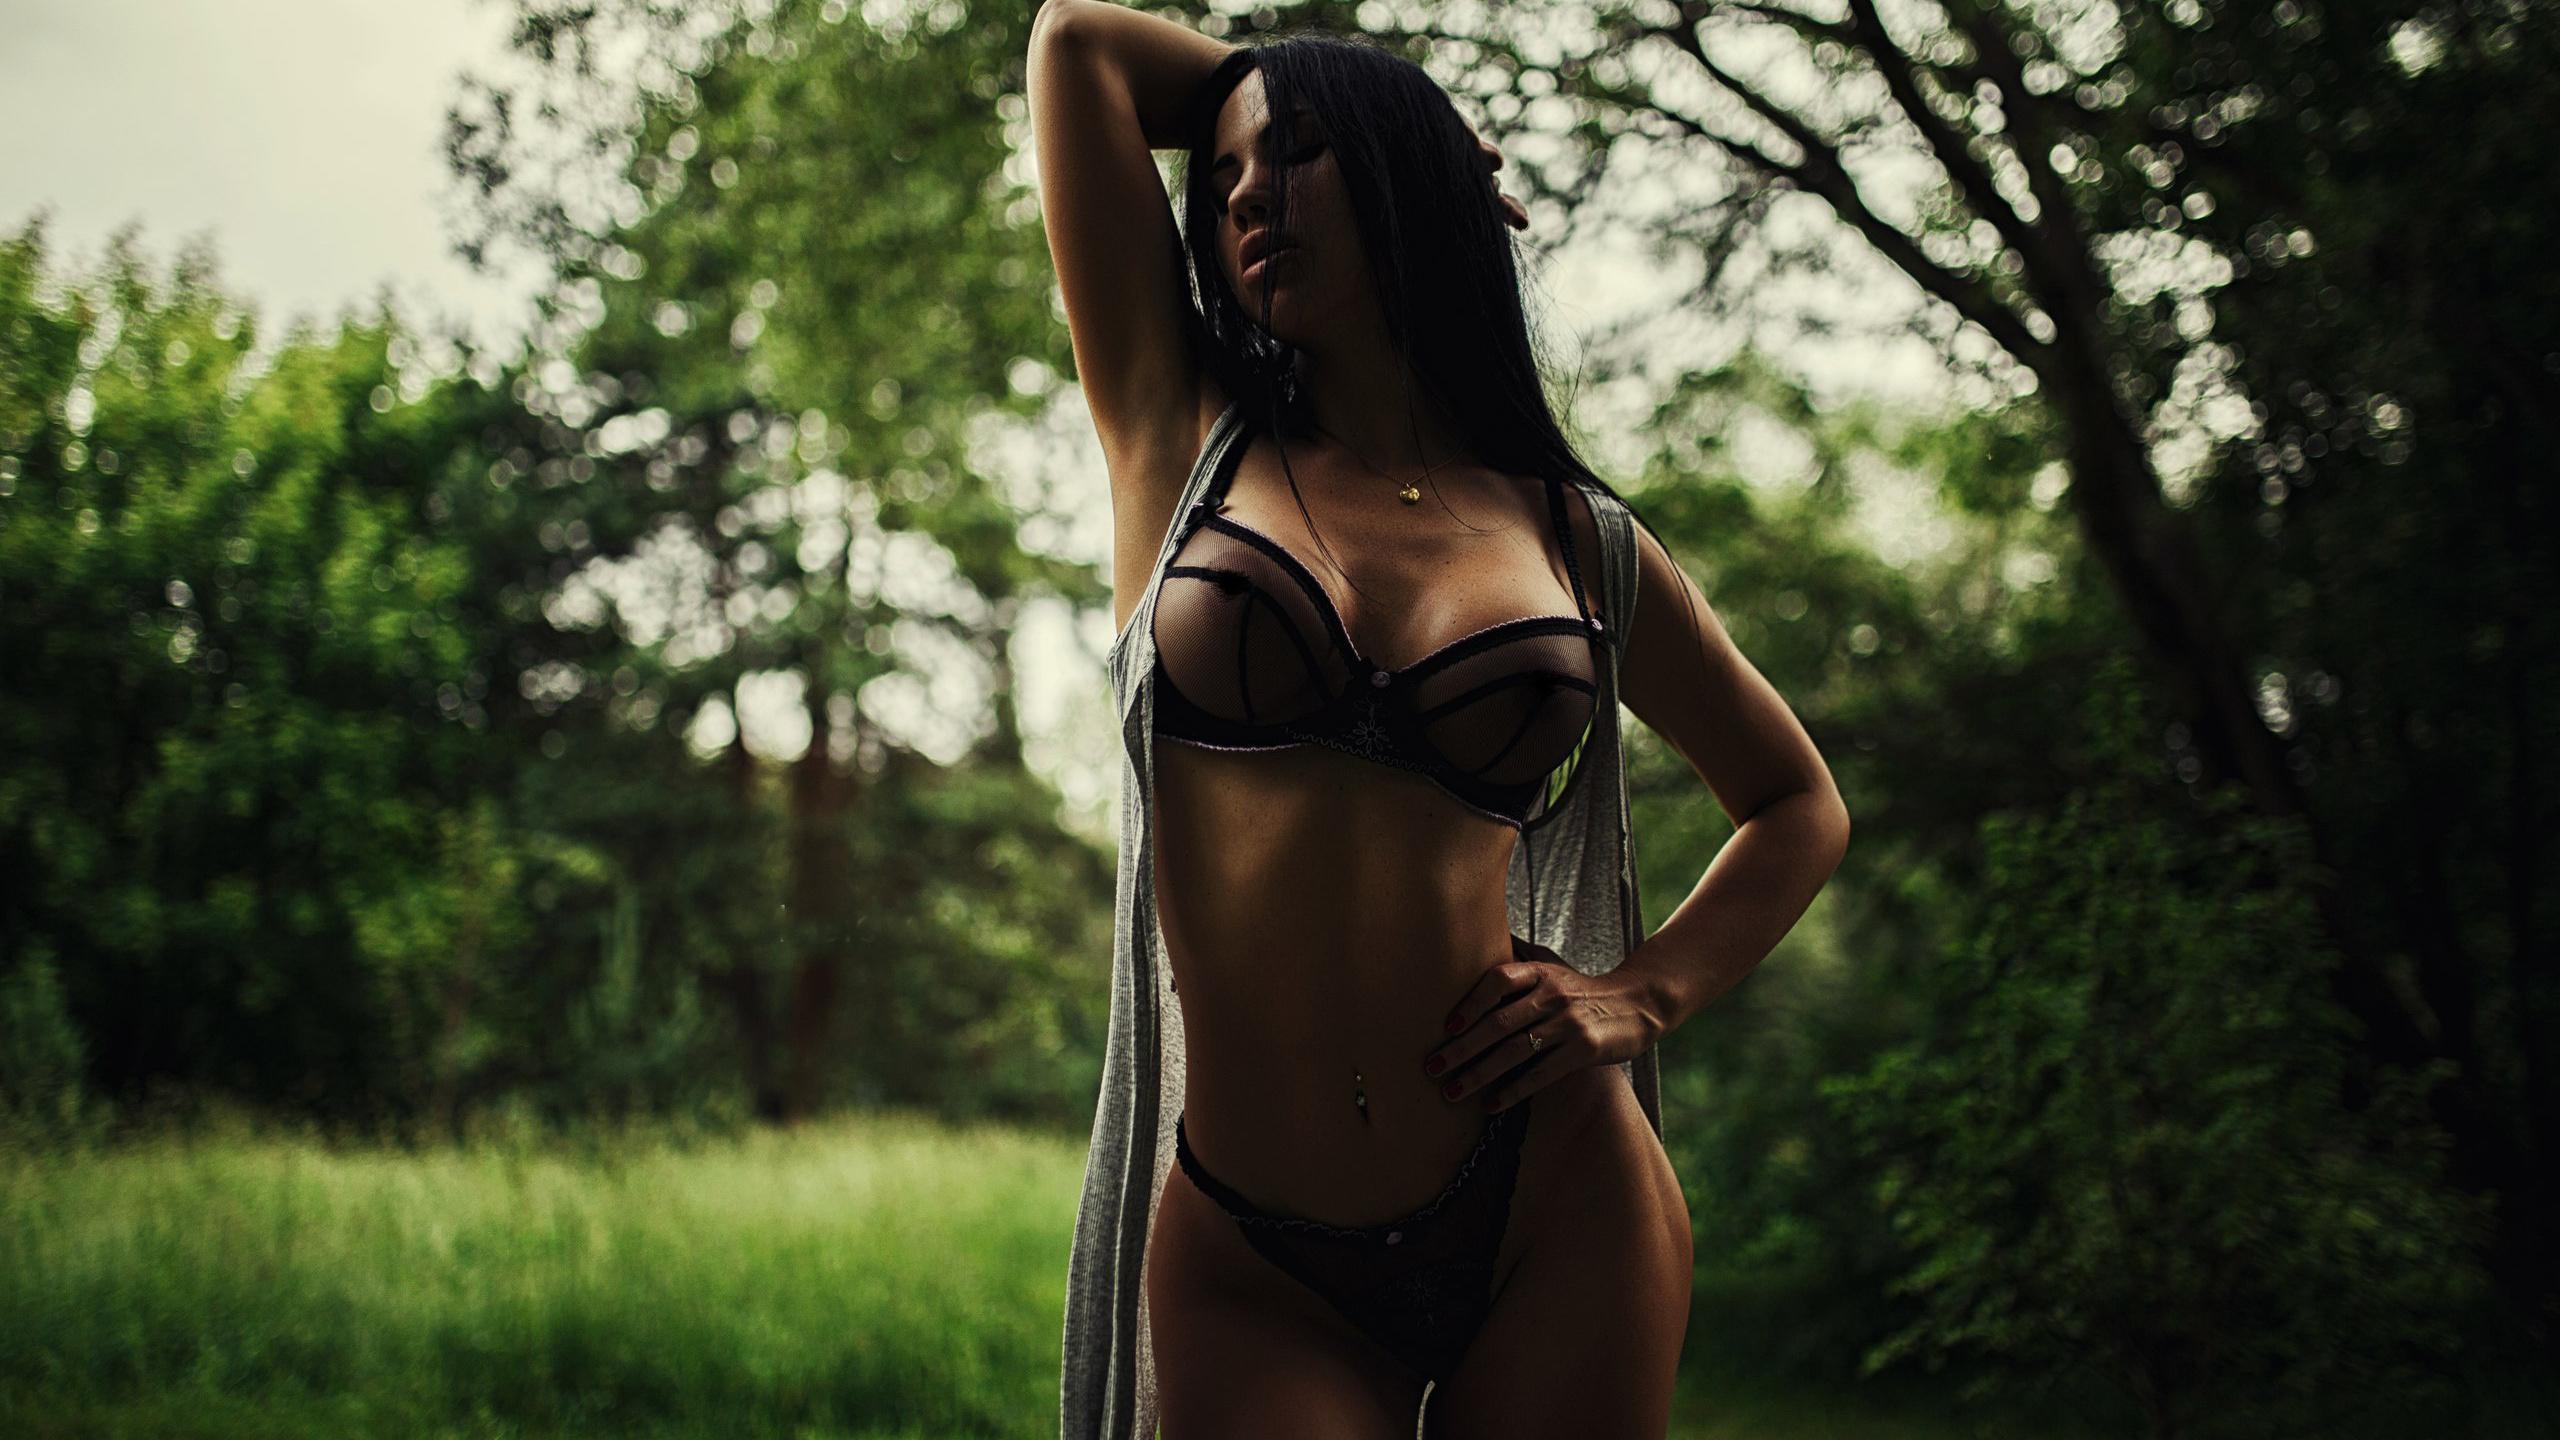 bryunetki-prekrasnaya-figura